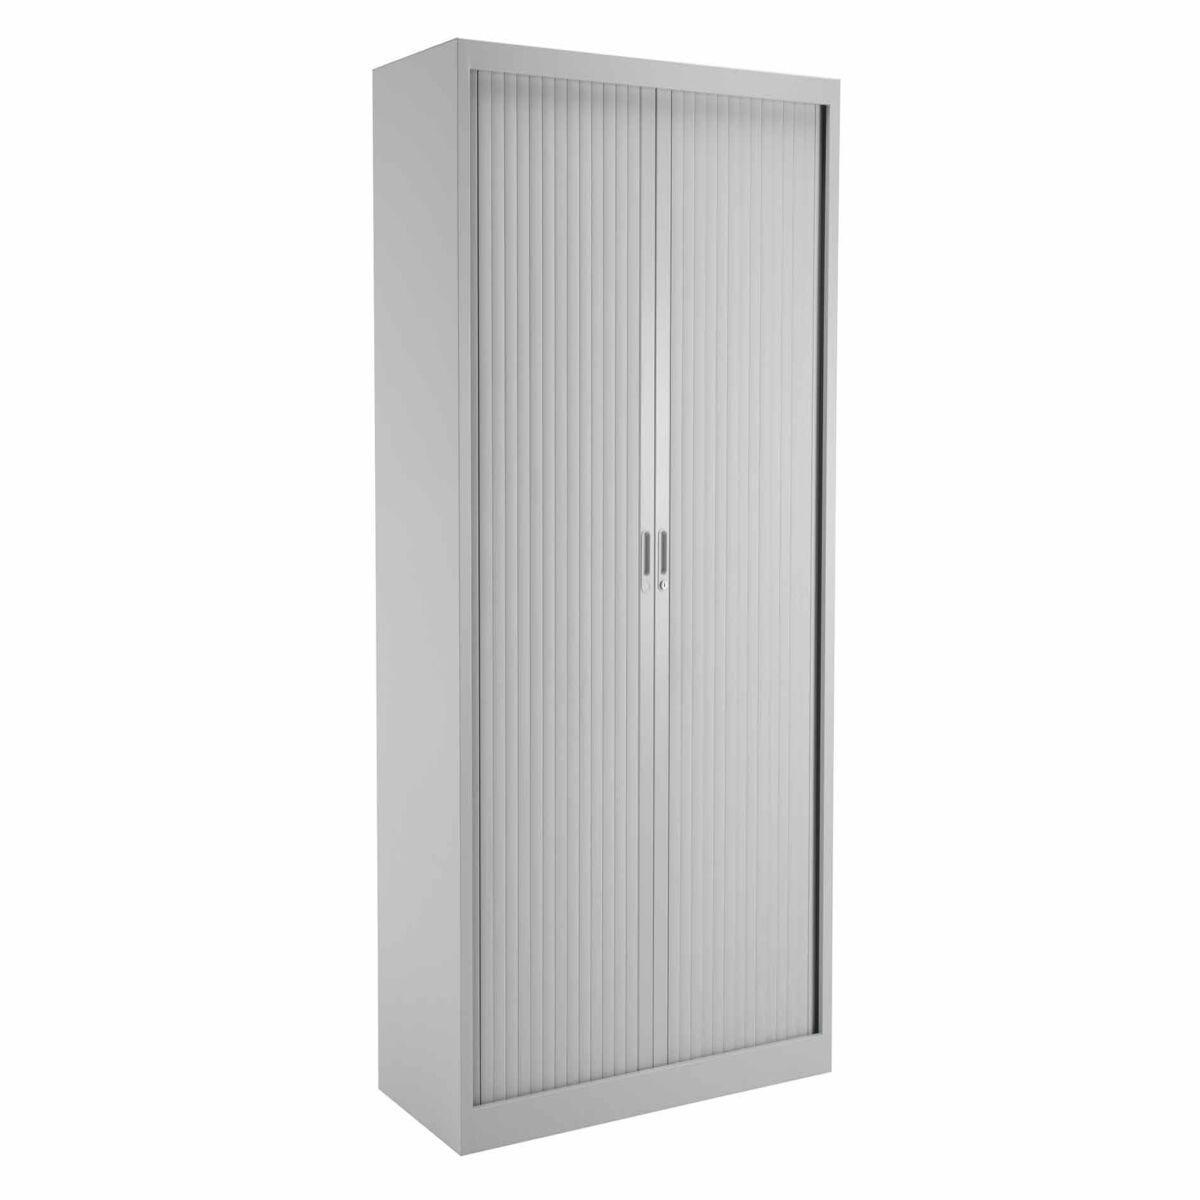 TC Office Talos Sliding Lockable Door Tambour Unit with 4 Shelves 1950mm Height